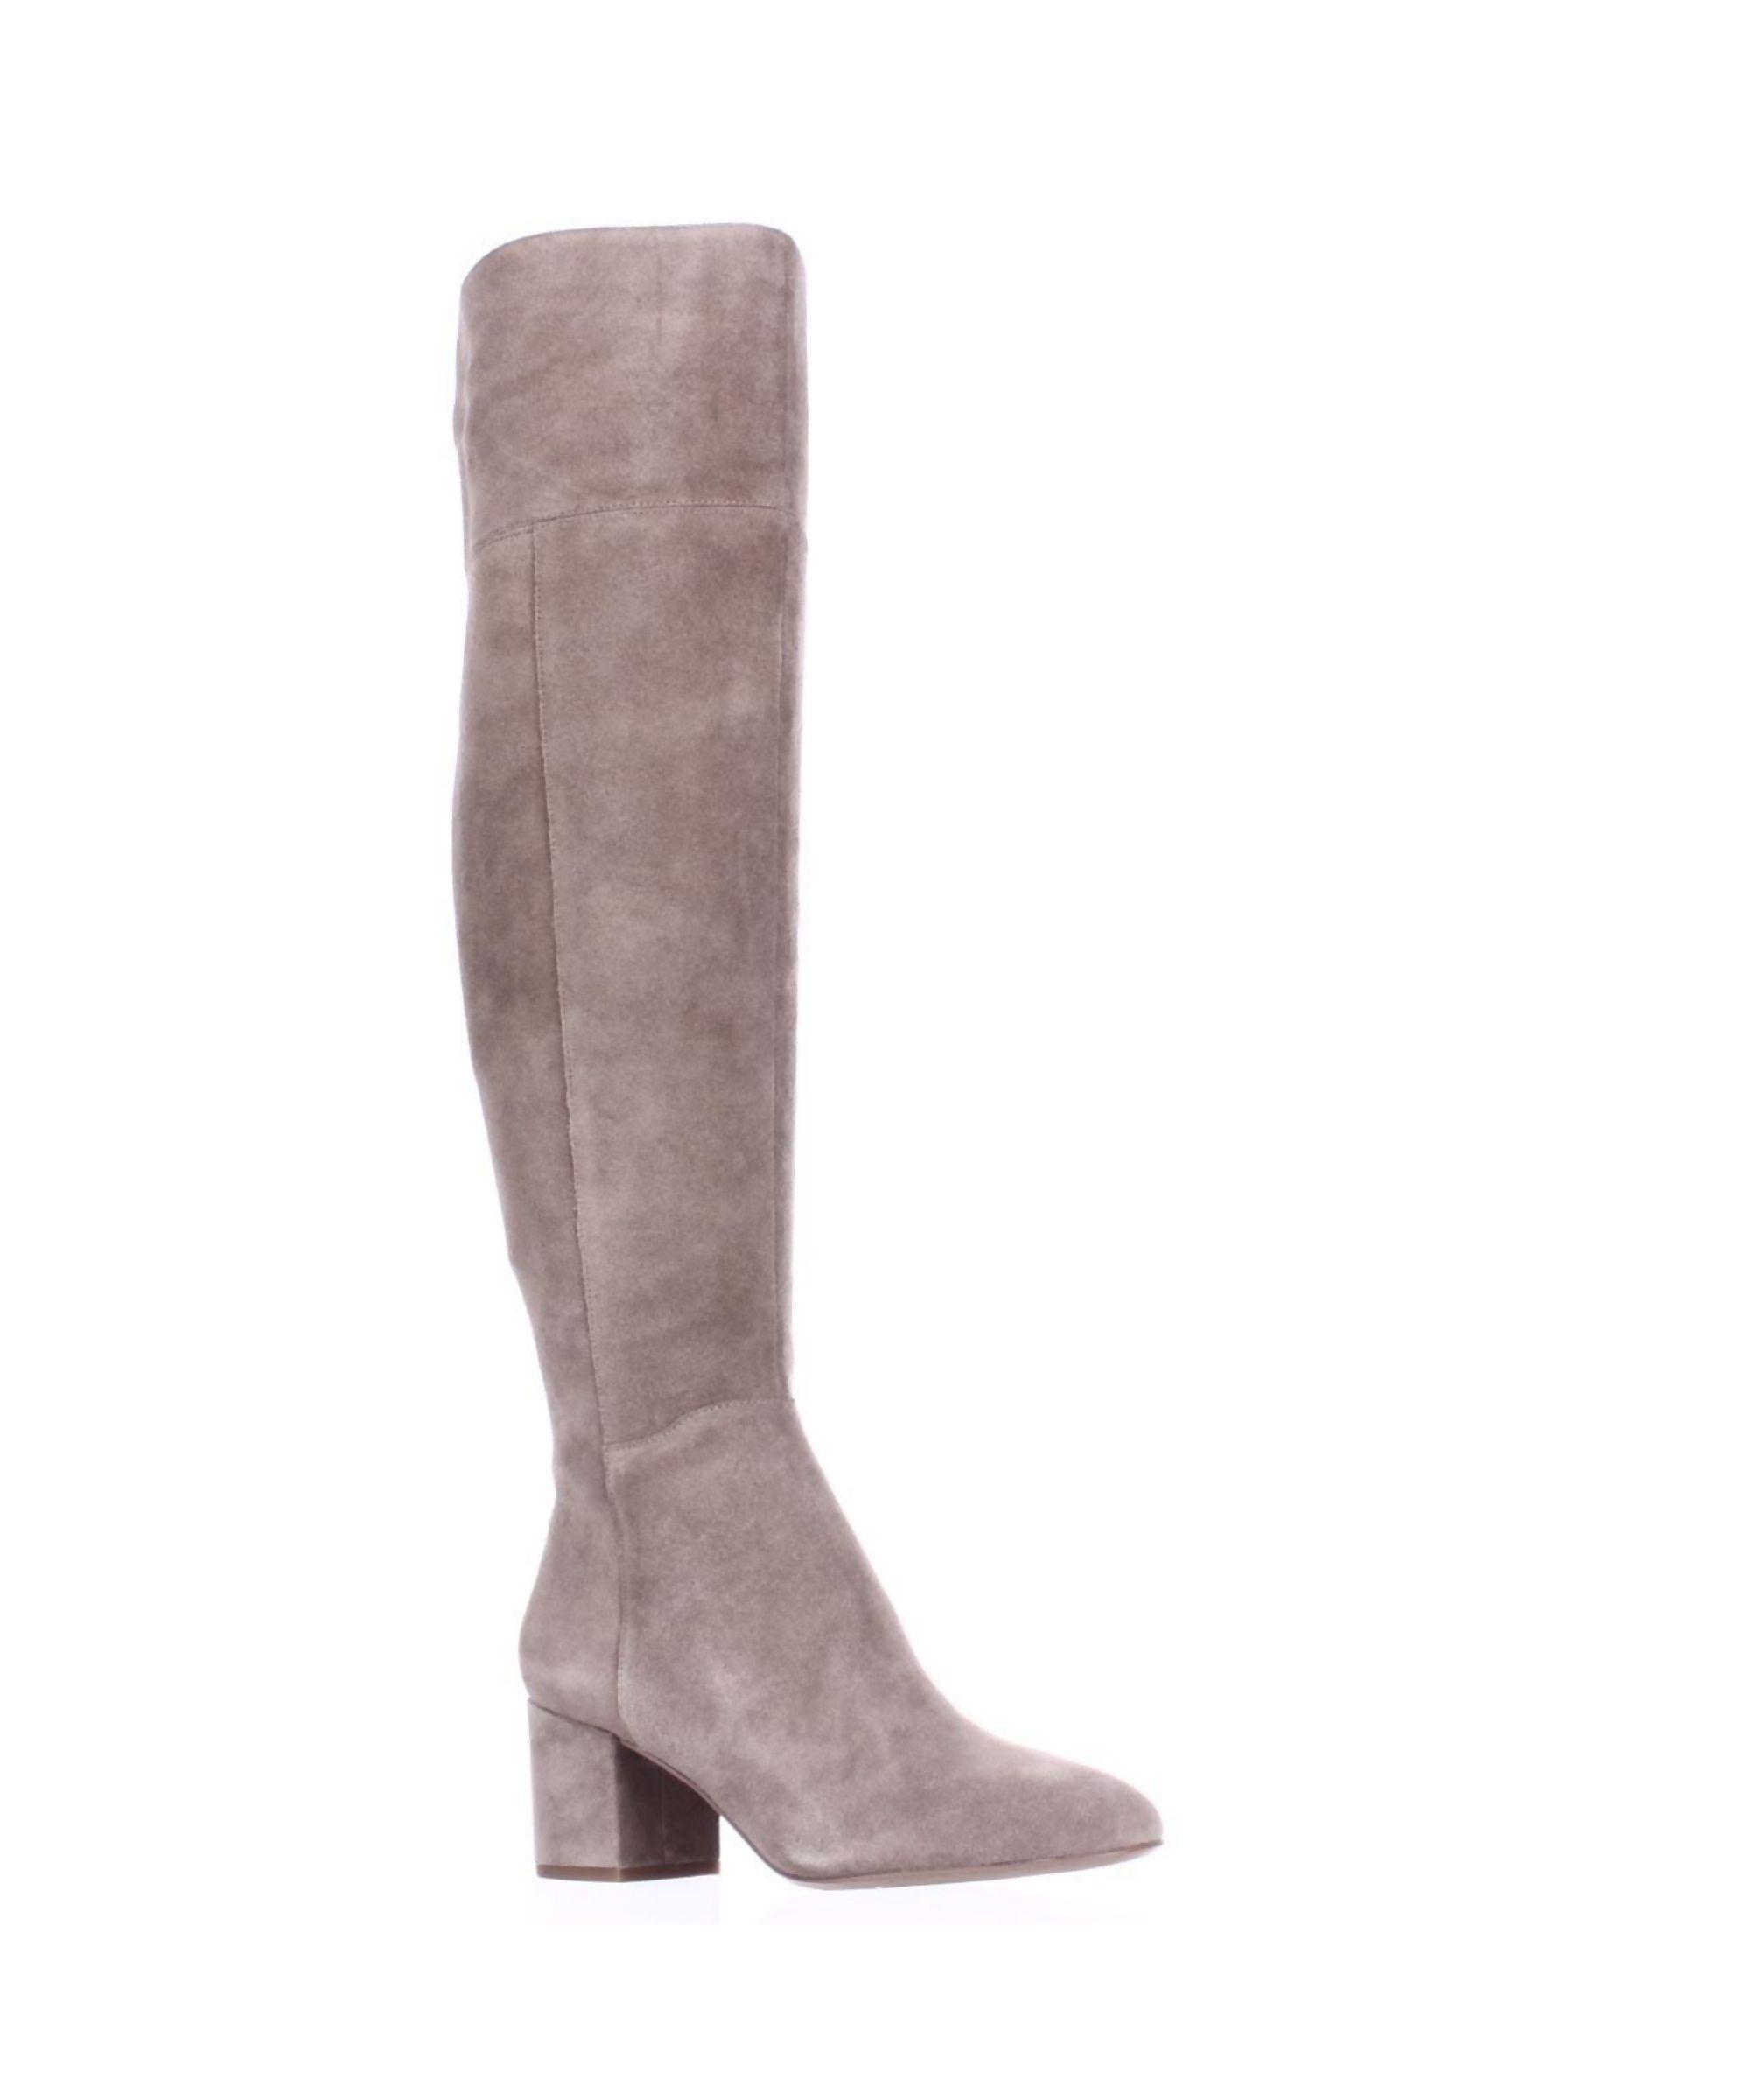 FRANCO SARTO | Franco Sarto Kerri Tall Block Heel Boots, Mushroom #Shoes # Boots